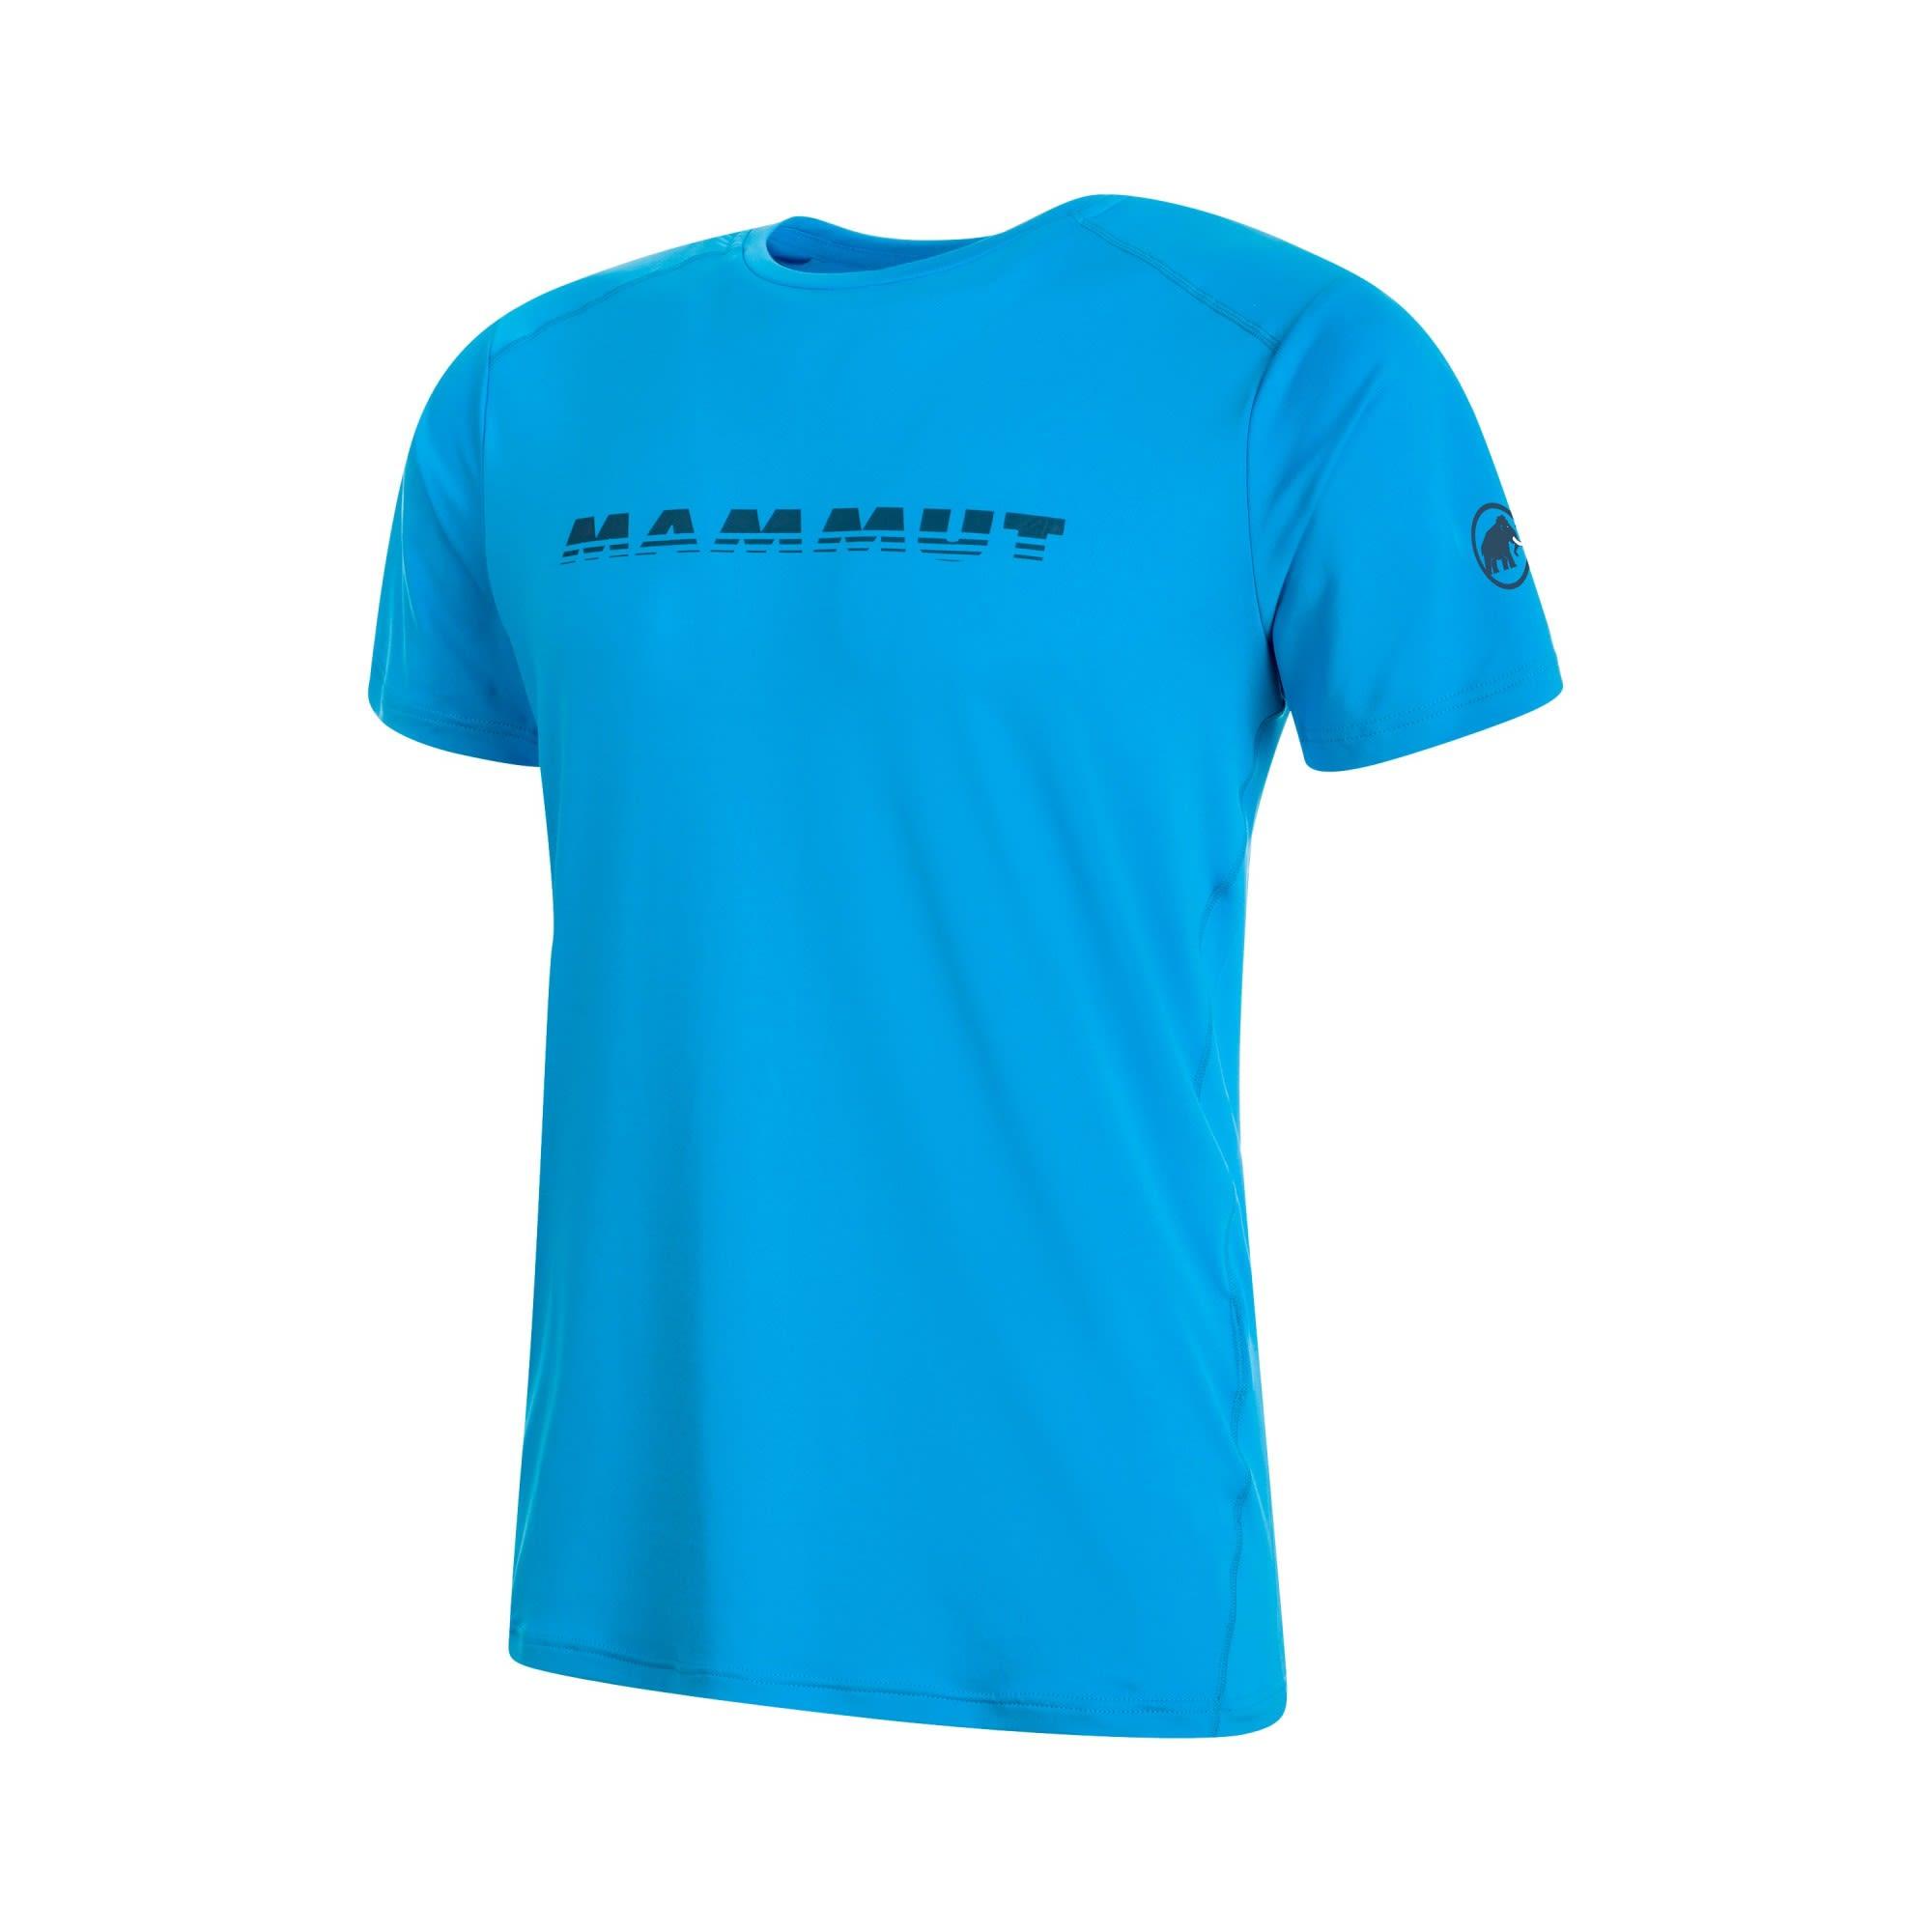 Mammut Splide Logo T-Shirt Blau, Male Kurzarm-Shirt, XL